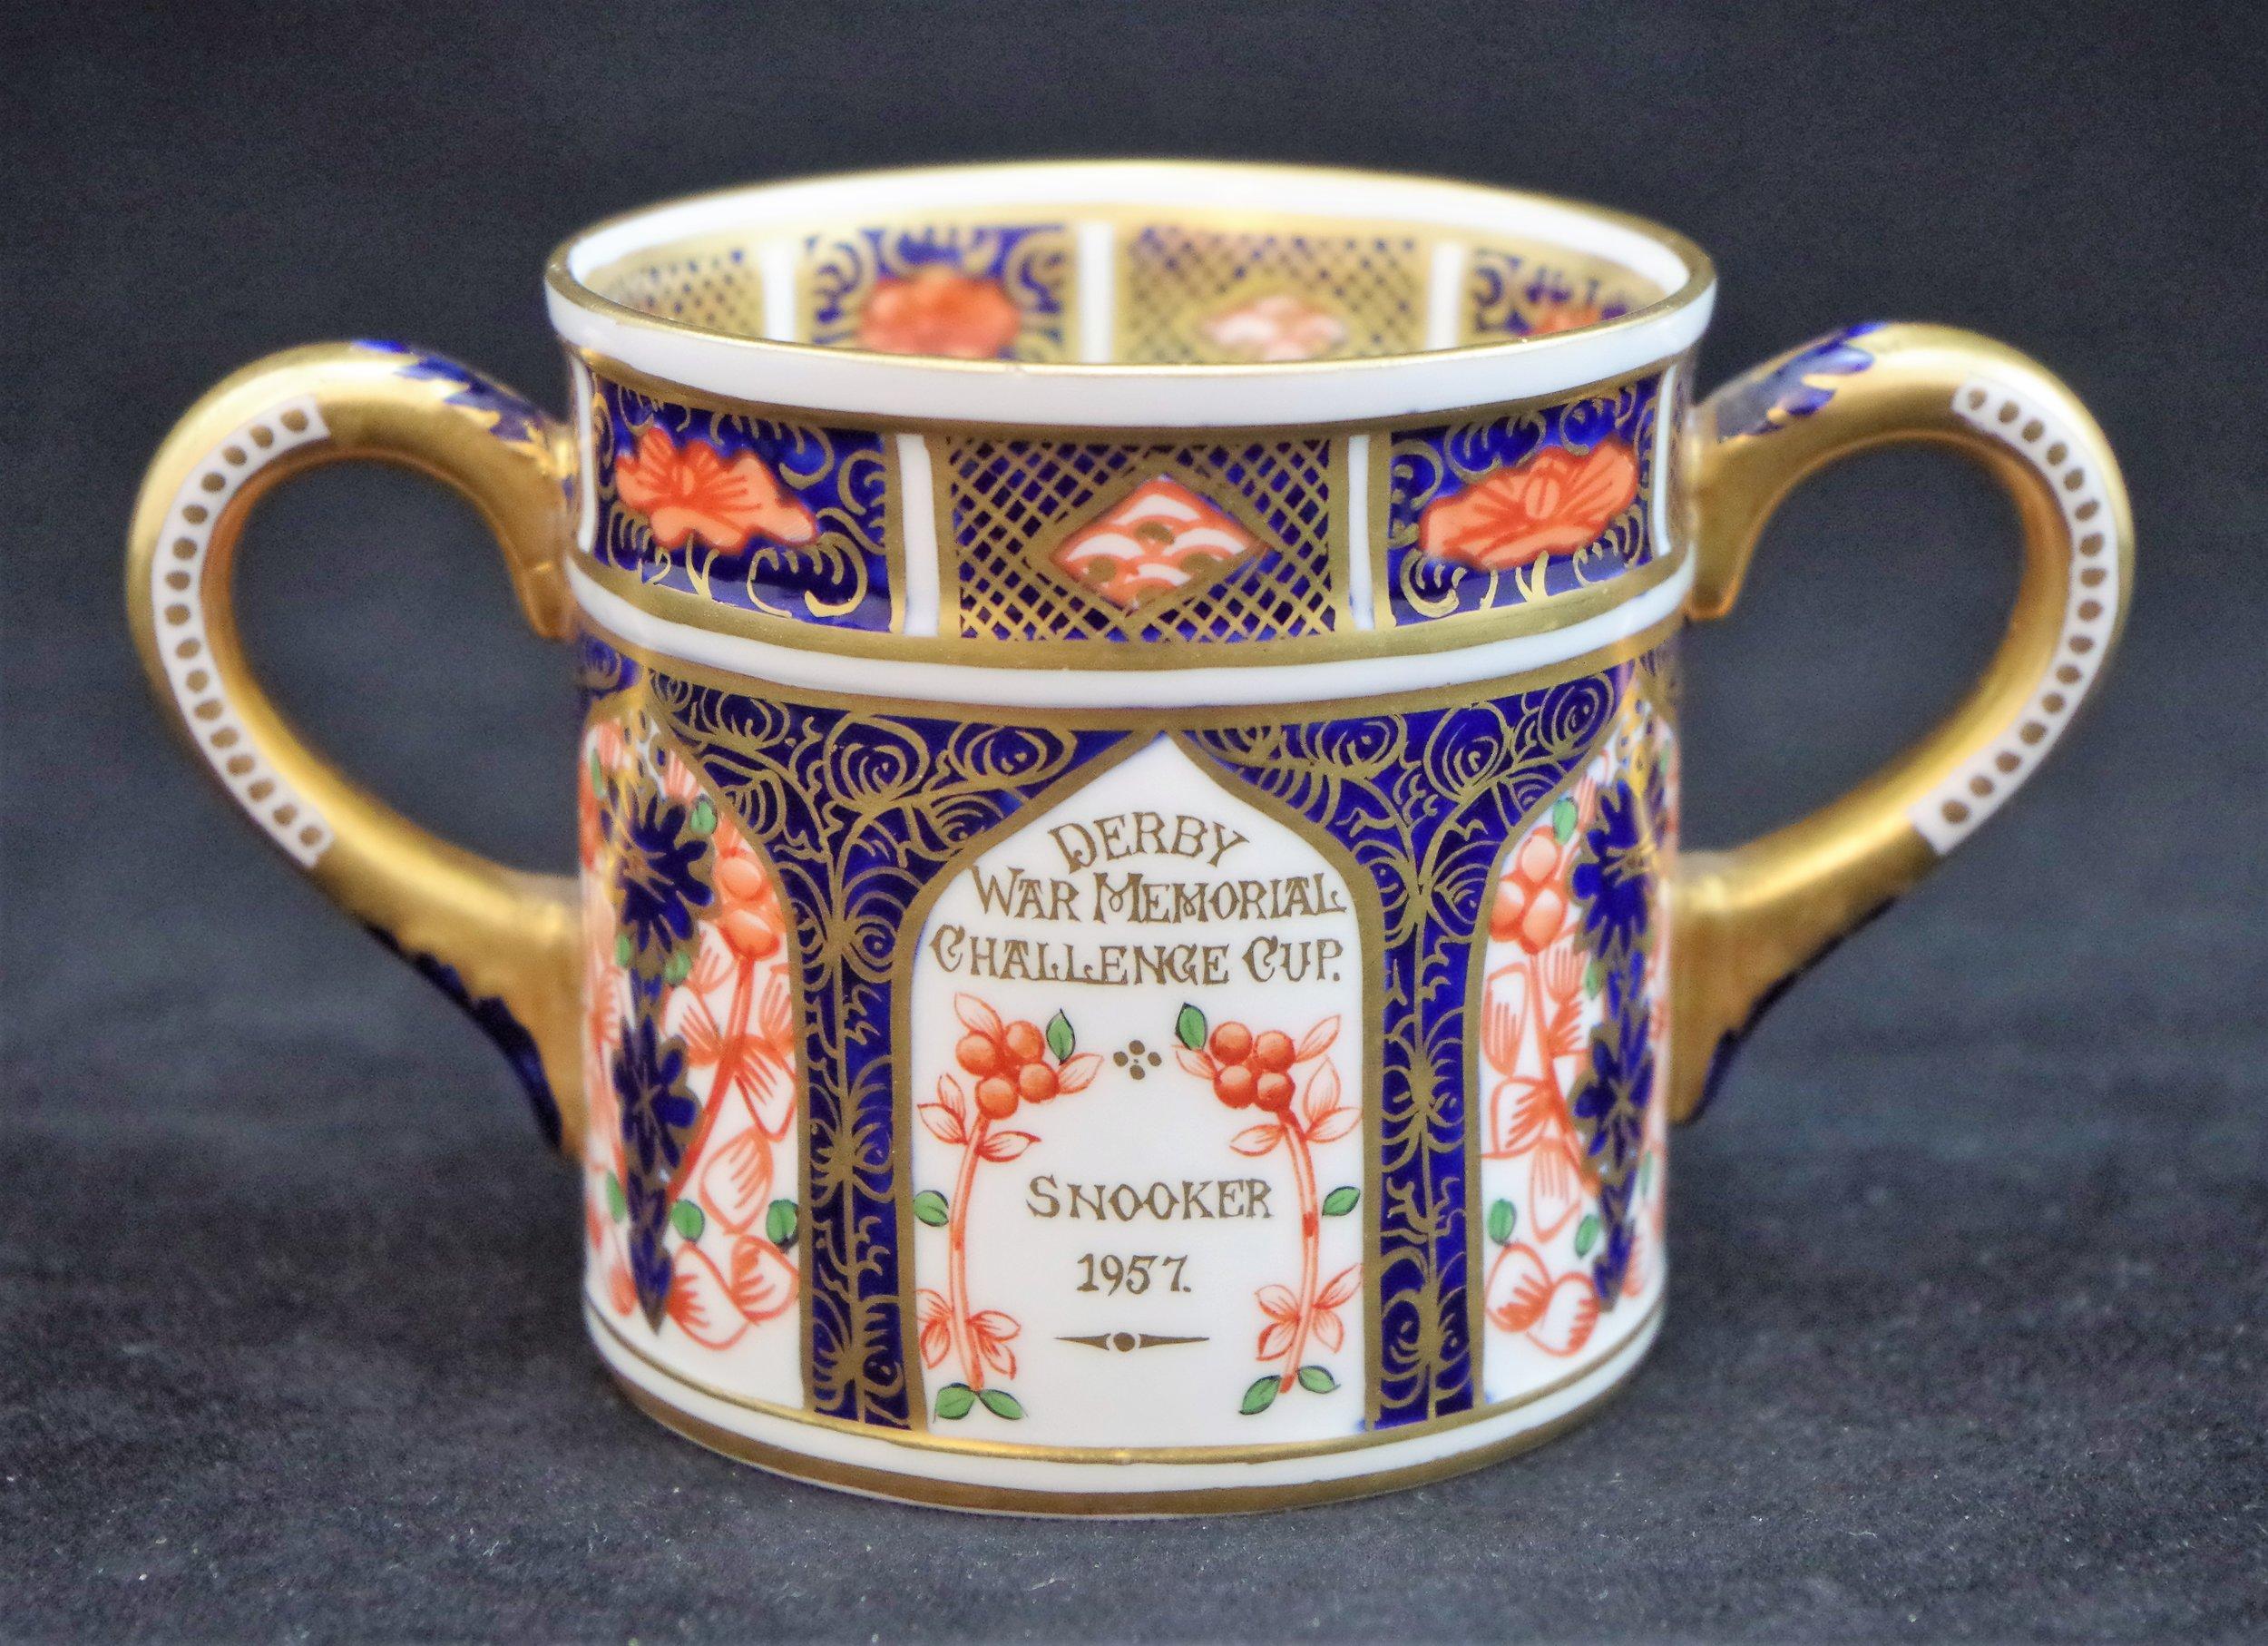 royal-crown-derby-1128-derby-borough-war-memorial-fund-challenge-cup-snooker-1957